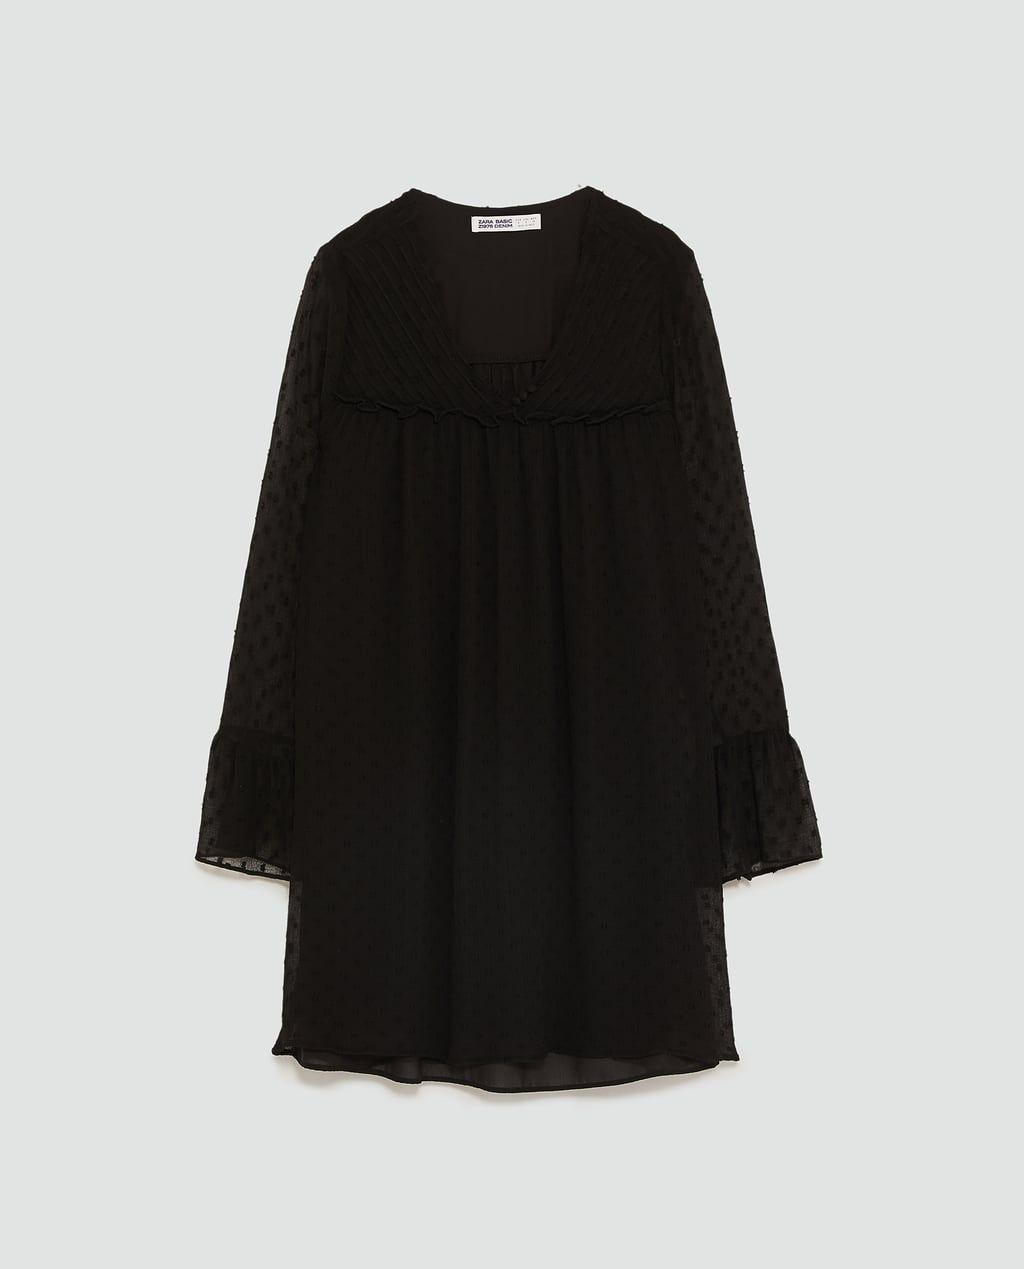 Zara Dan 8 Tul Elbise Resmi Fashion Women Bell Sleeve Top